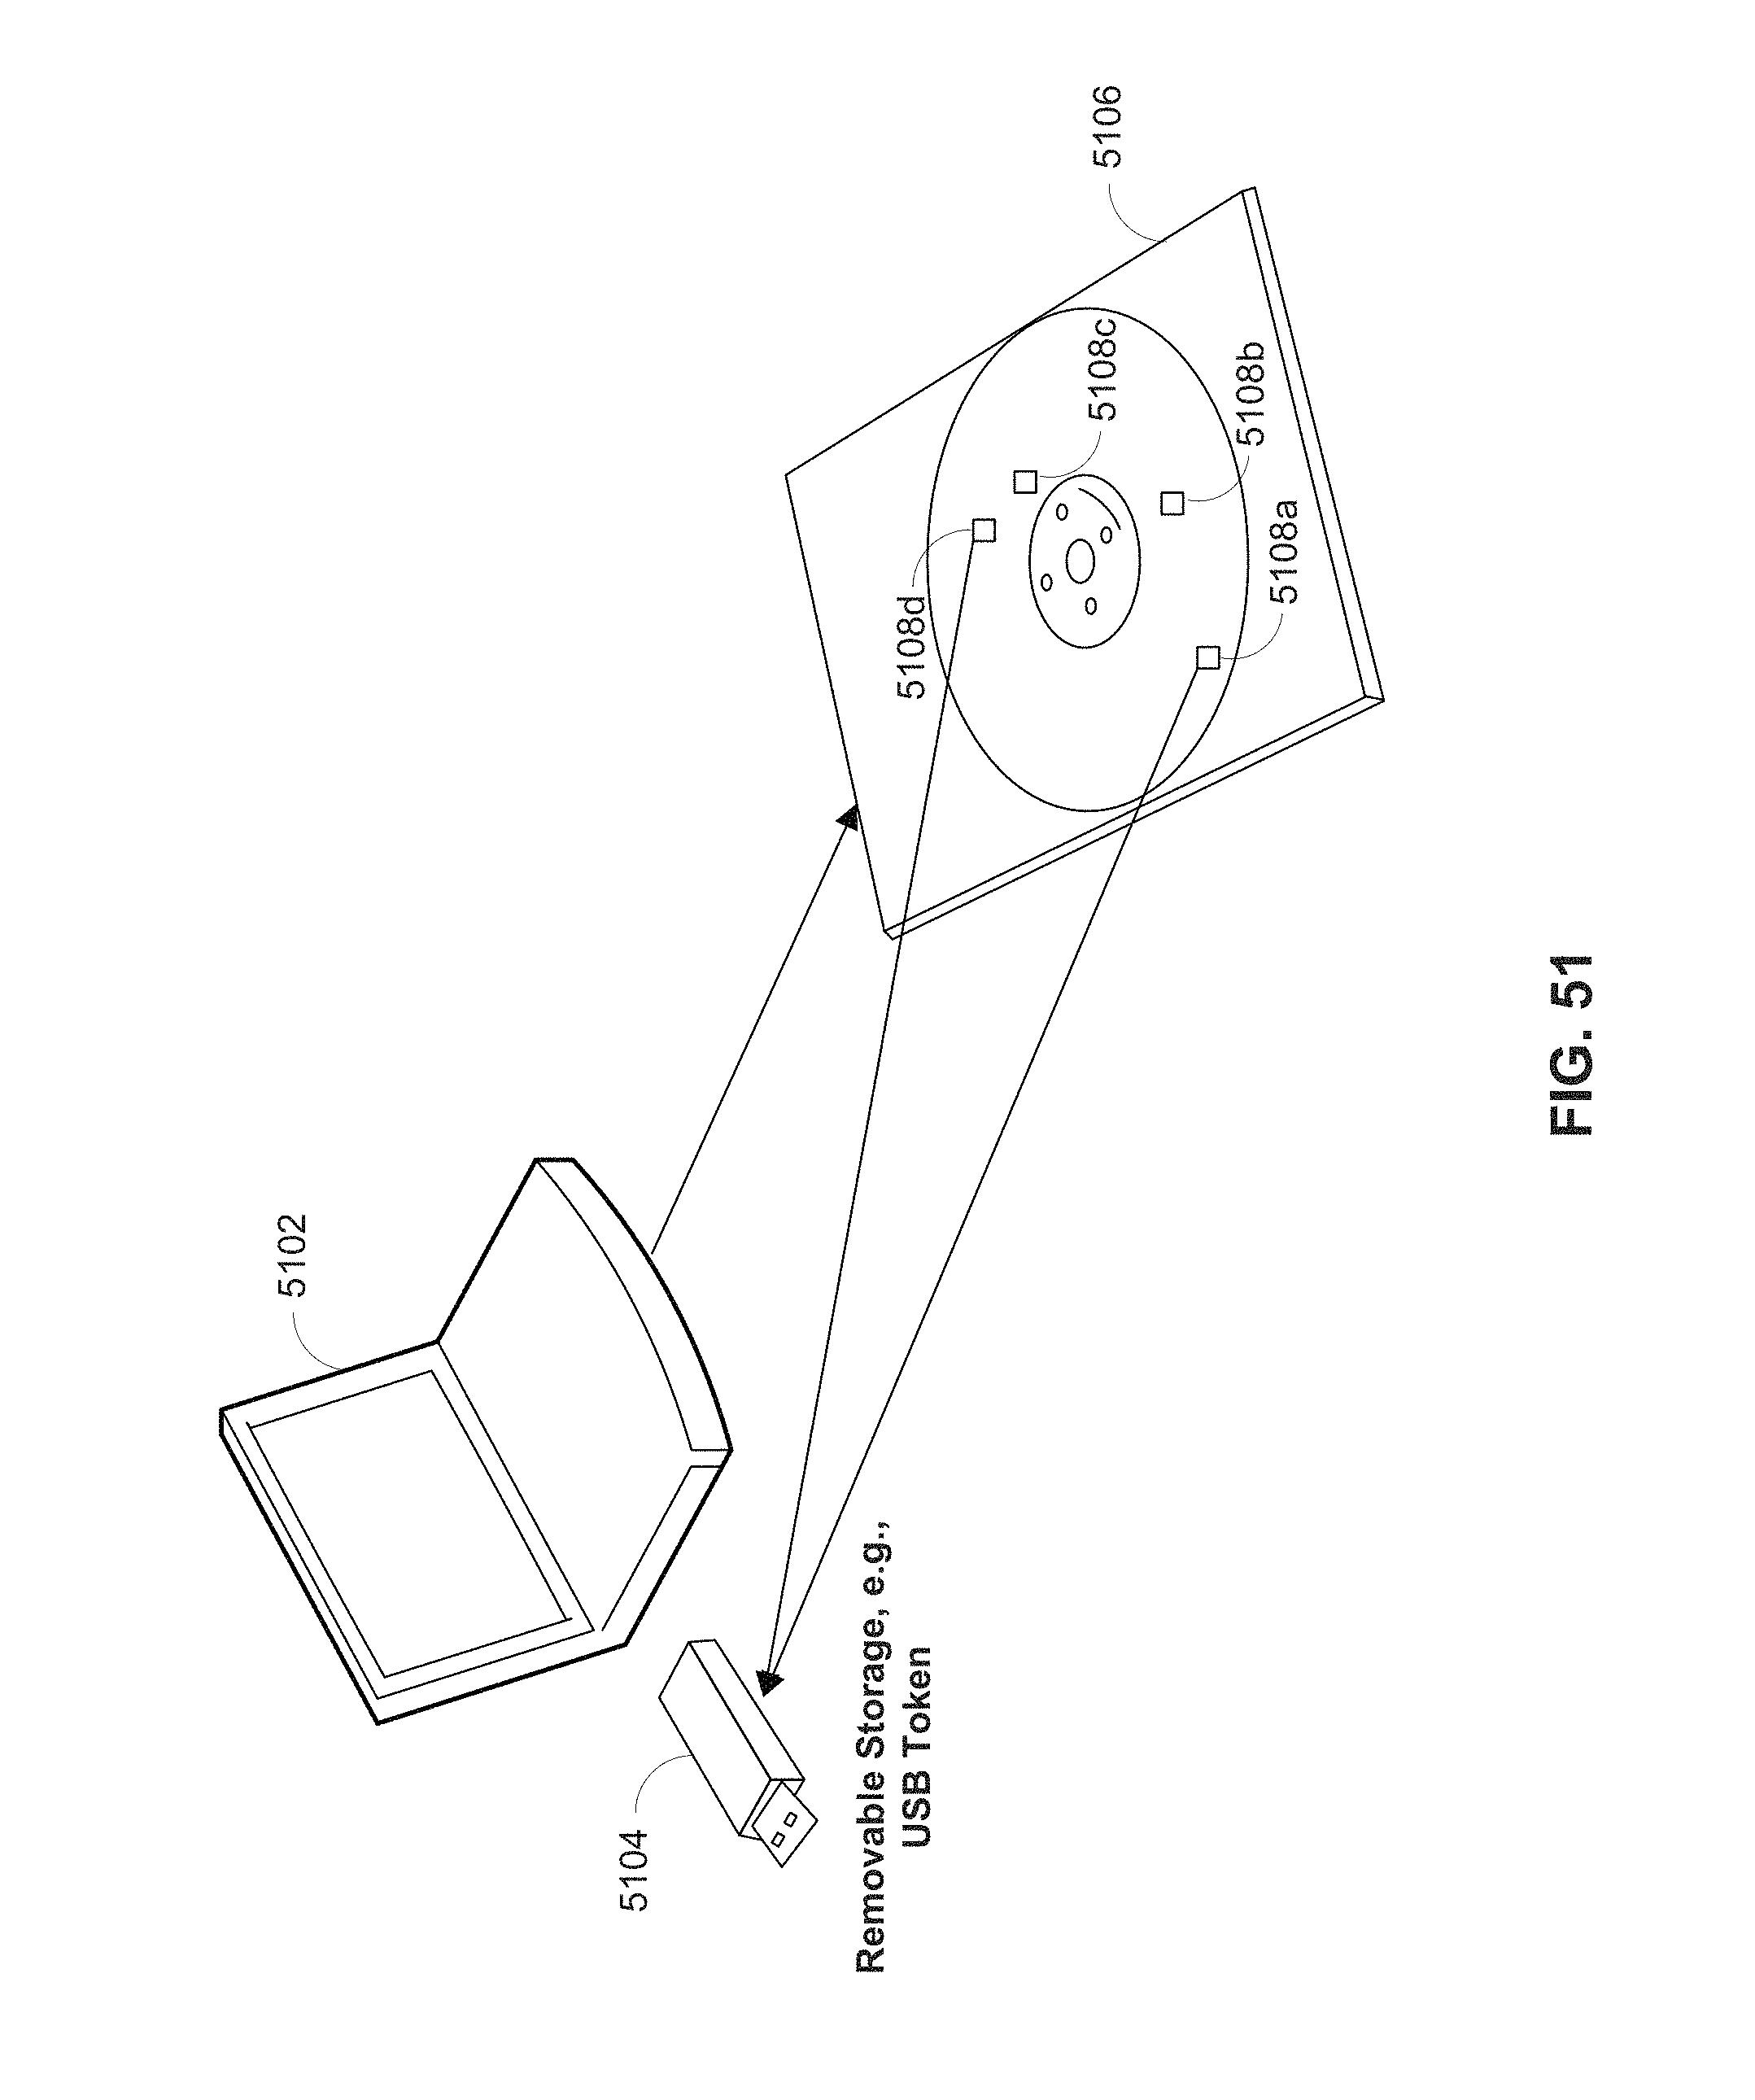 Patent US 9,785,785 B2